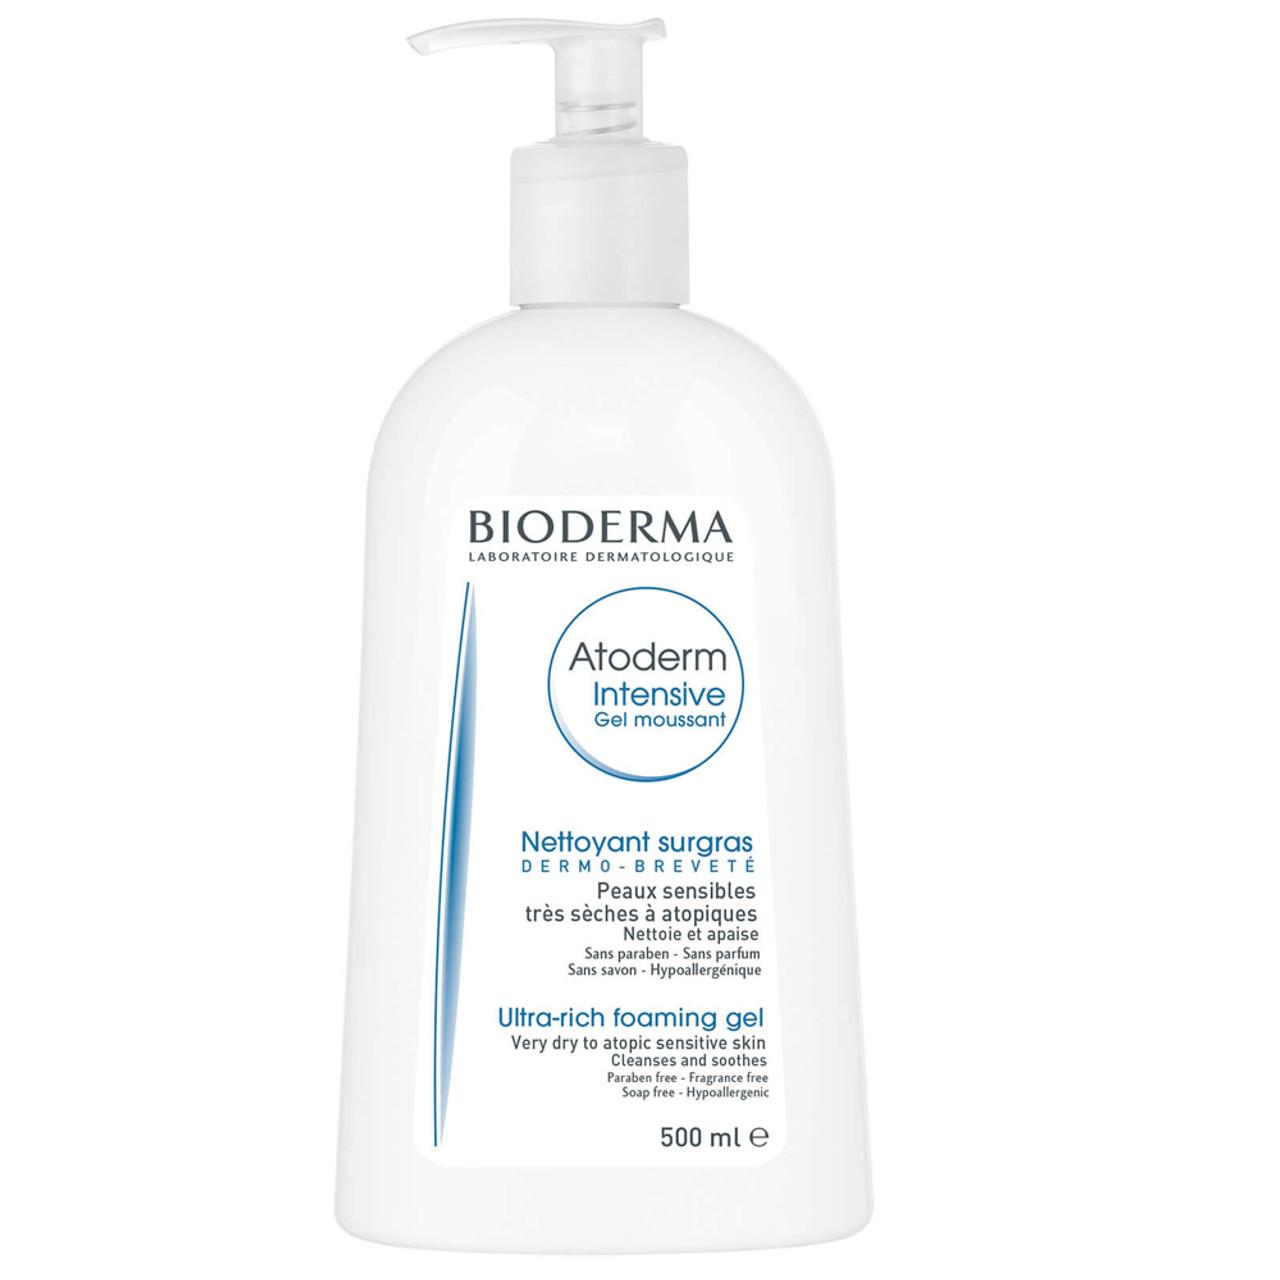 Bioderma Atoderm Intensive Foaming Gel 500mL